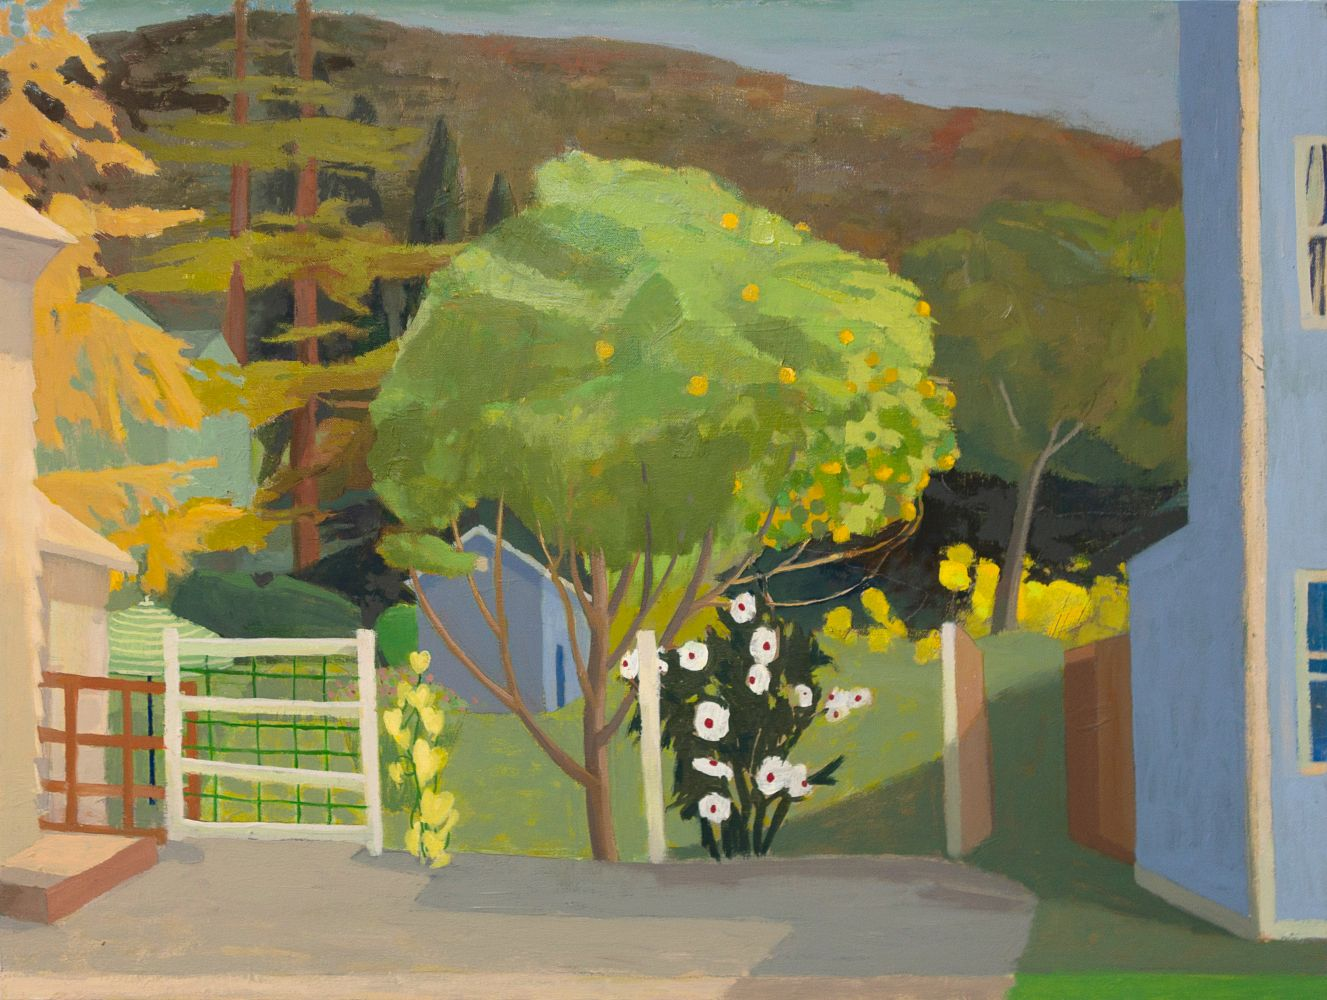 Celia Reisman, Halfway Hartford, oil on canvas, 24 x 32 inches